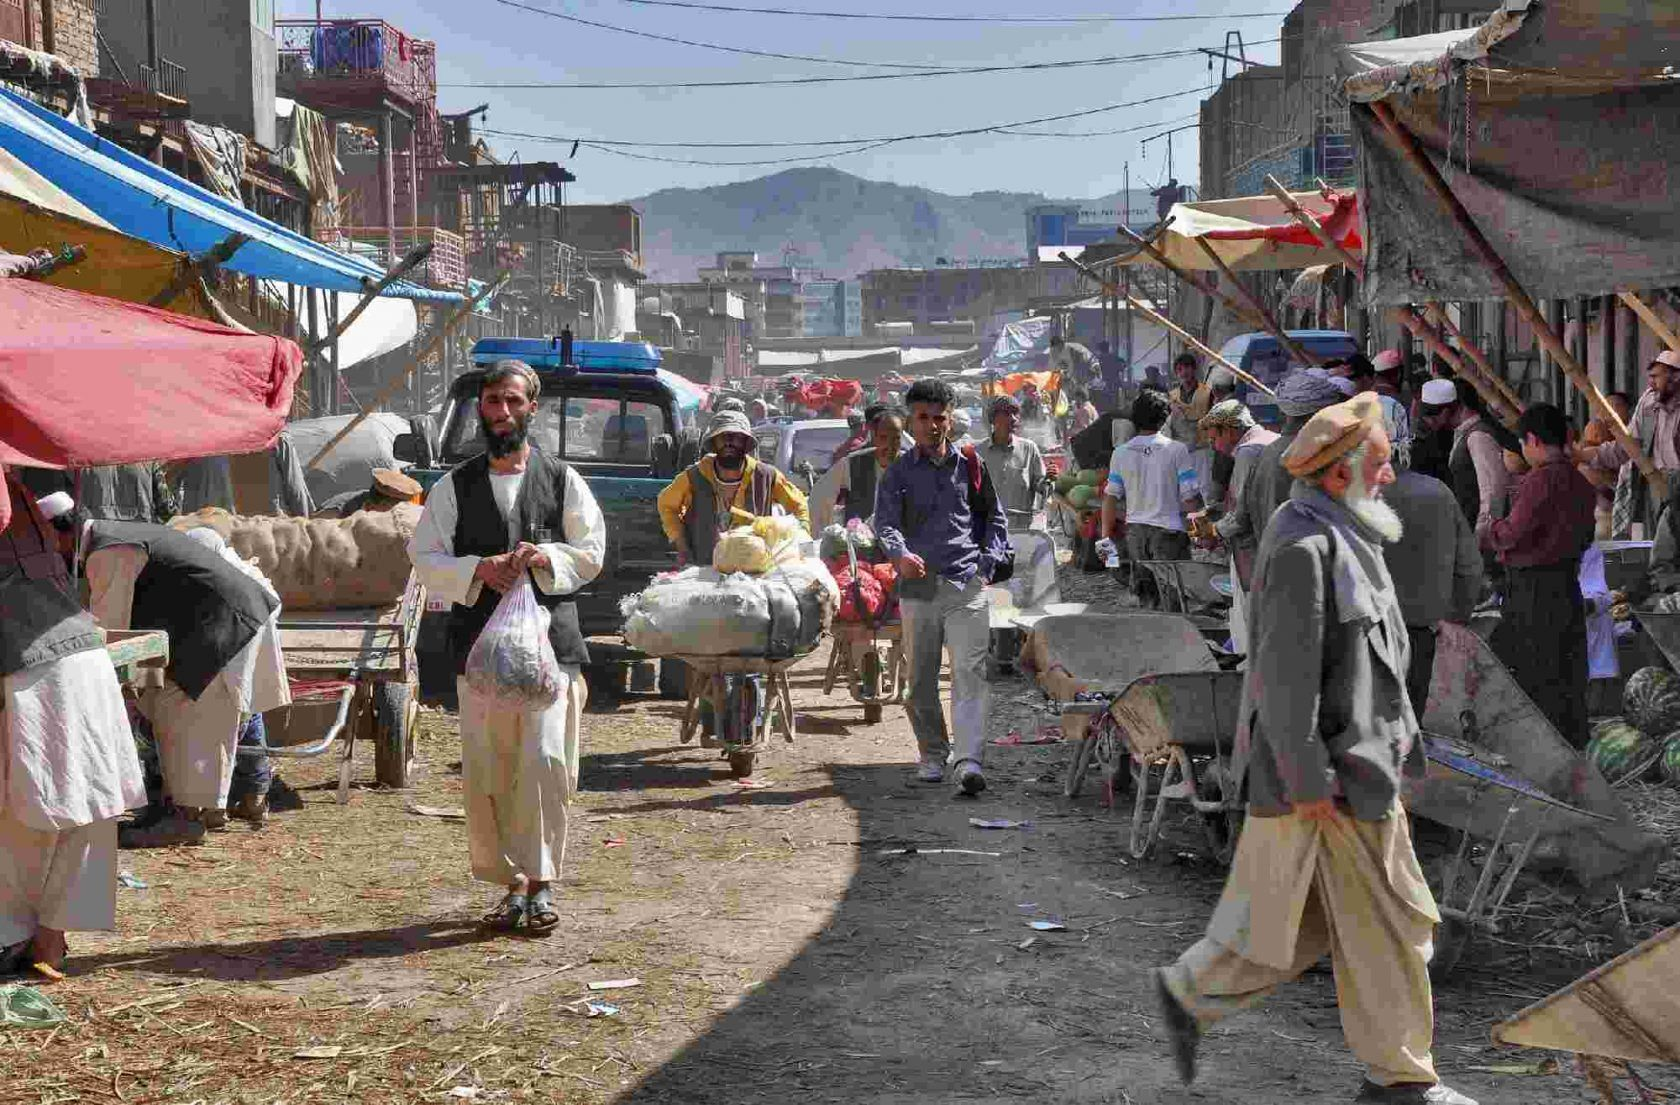 Talebani a Kabul, un blitz e i suoi misteri